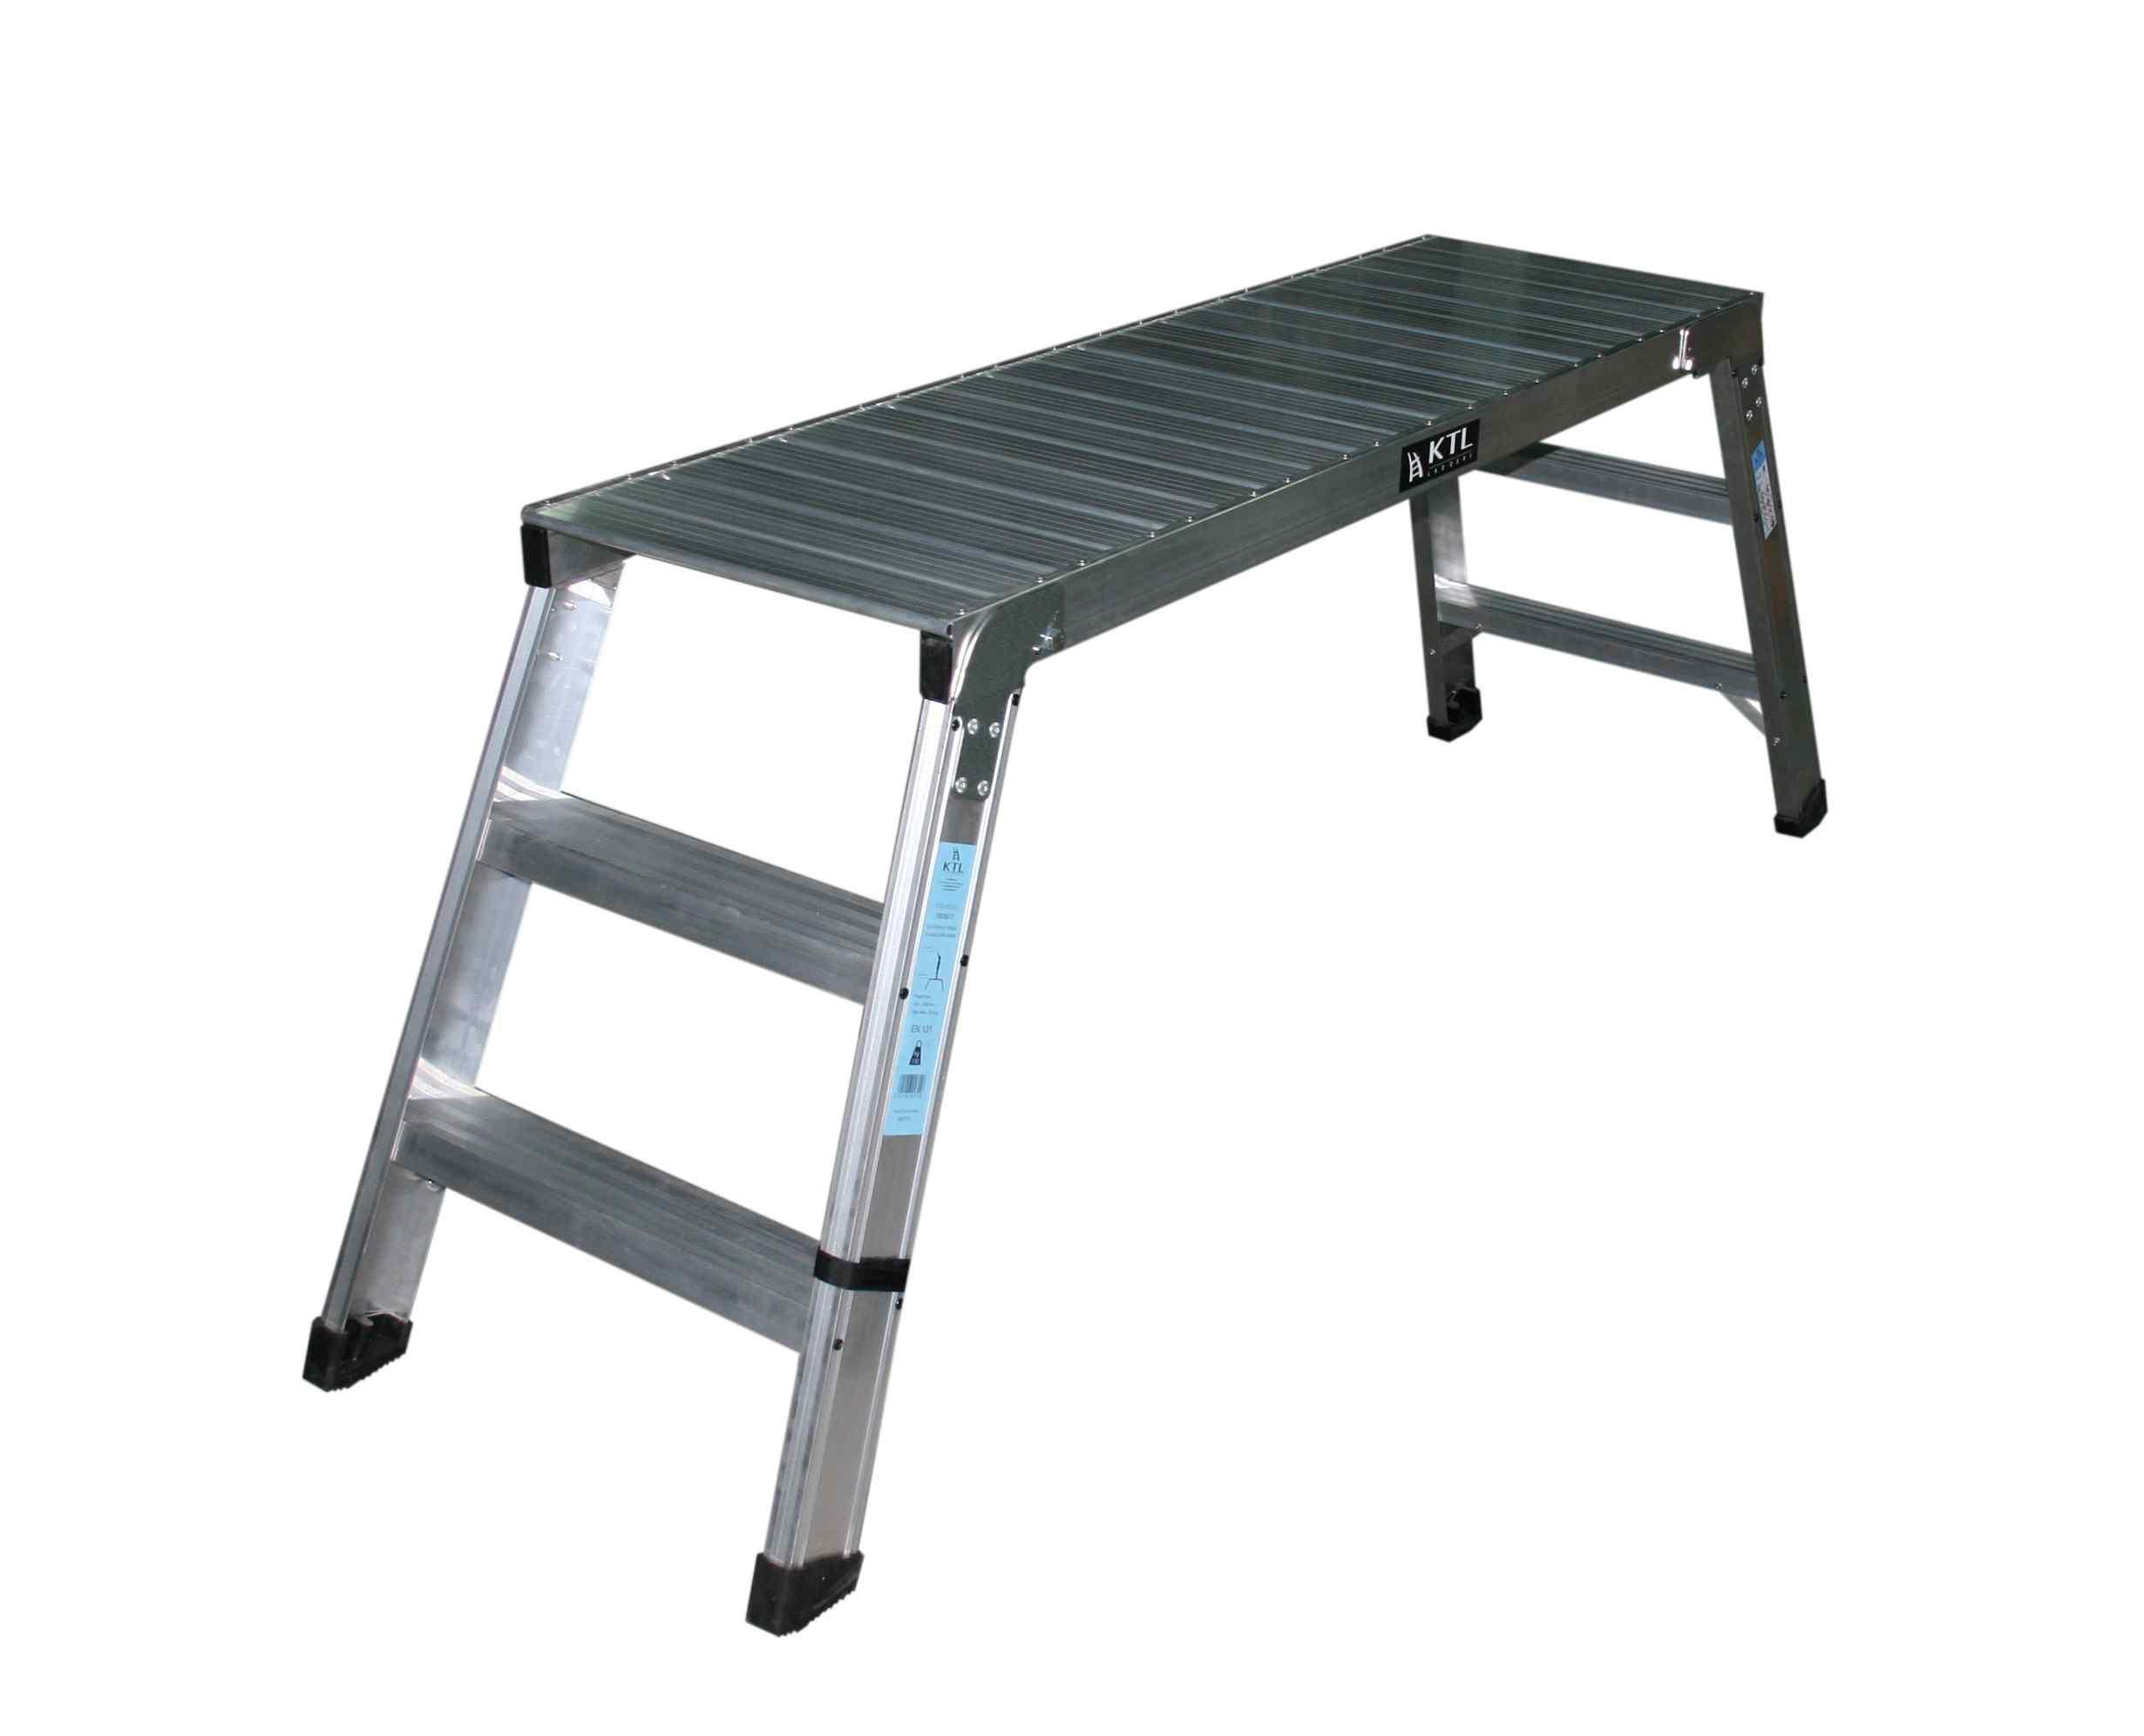 Andamio Plegable y Portatil - 1 Peldaños - Plataforma 30 x 90cm